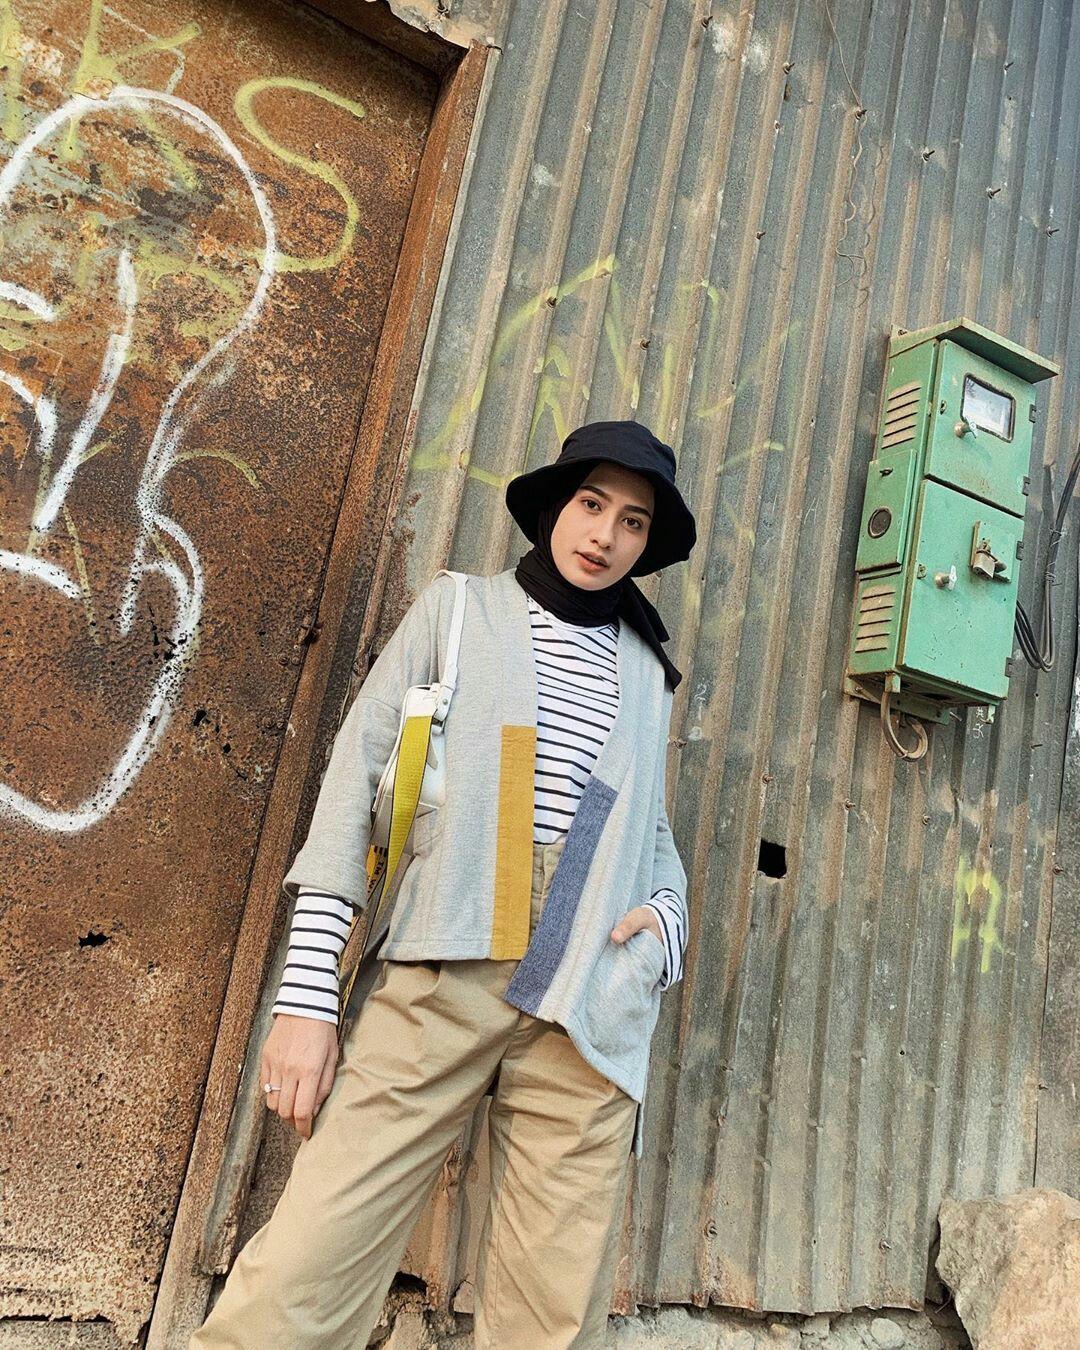 Pin oleh 🌼 di Ootd Hijab | Casual hijab outfit, Pakaian ...